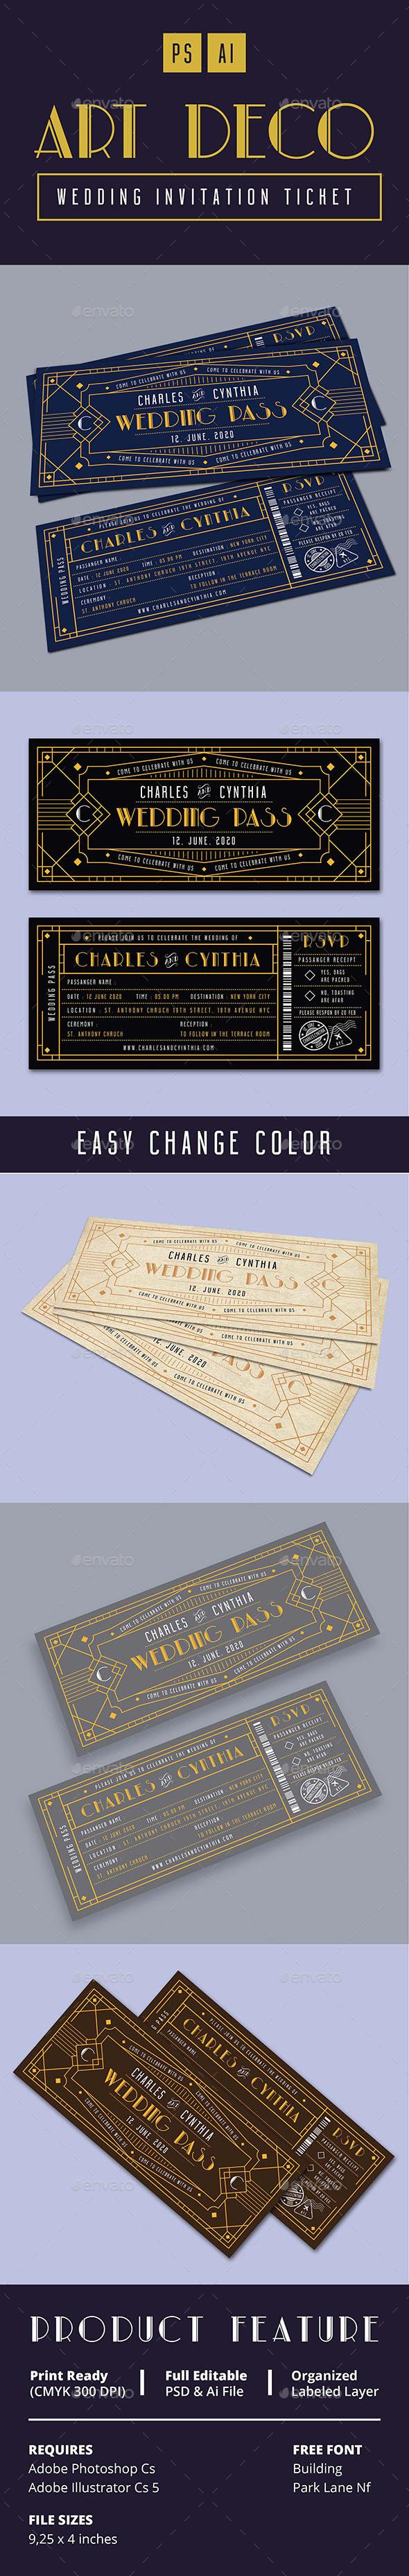 Art Deco Wedding Invitation Ticket Card - Weddings Cards & Invites